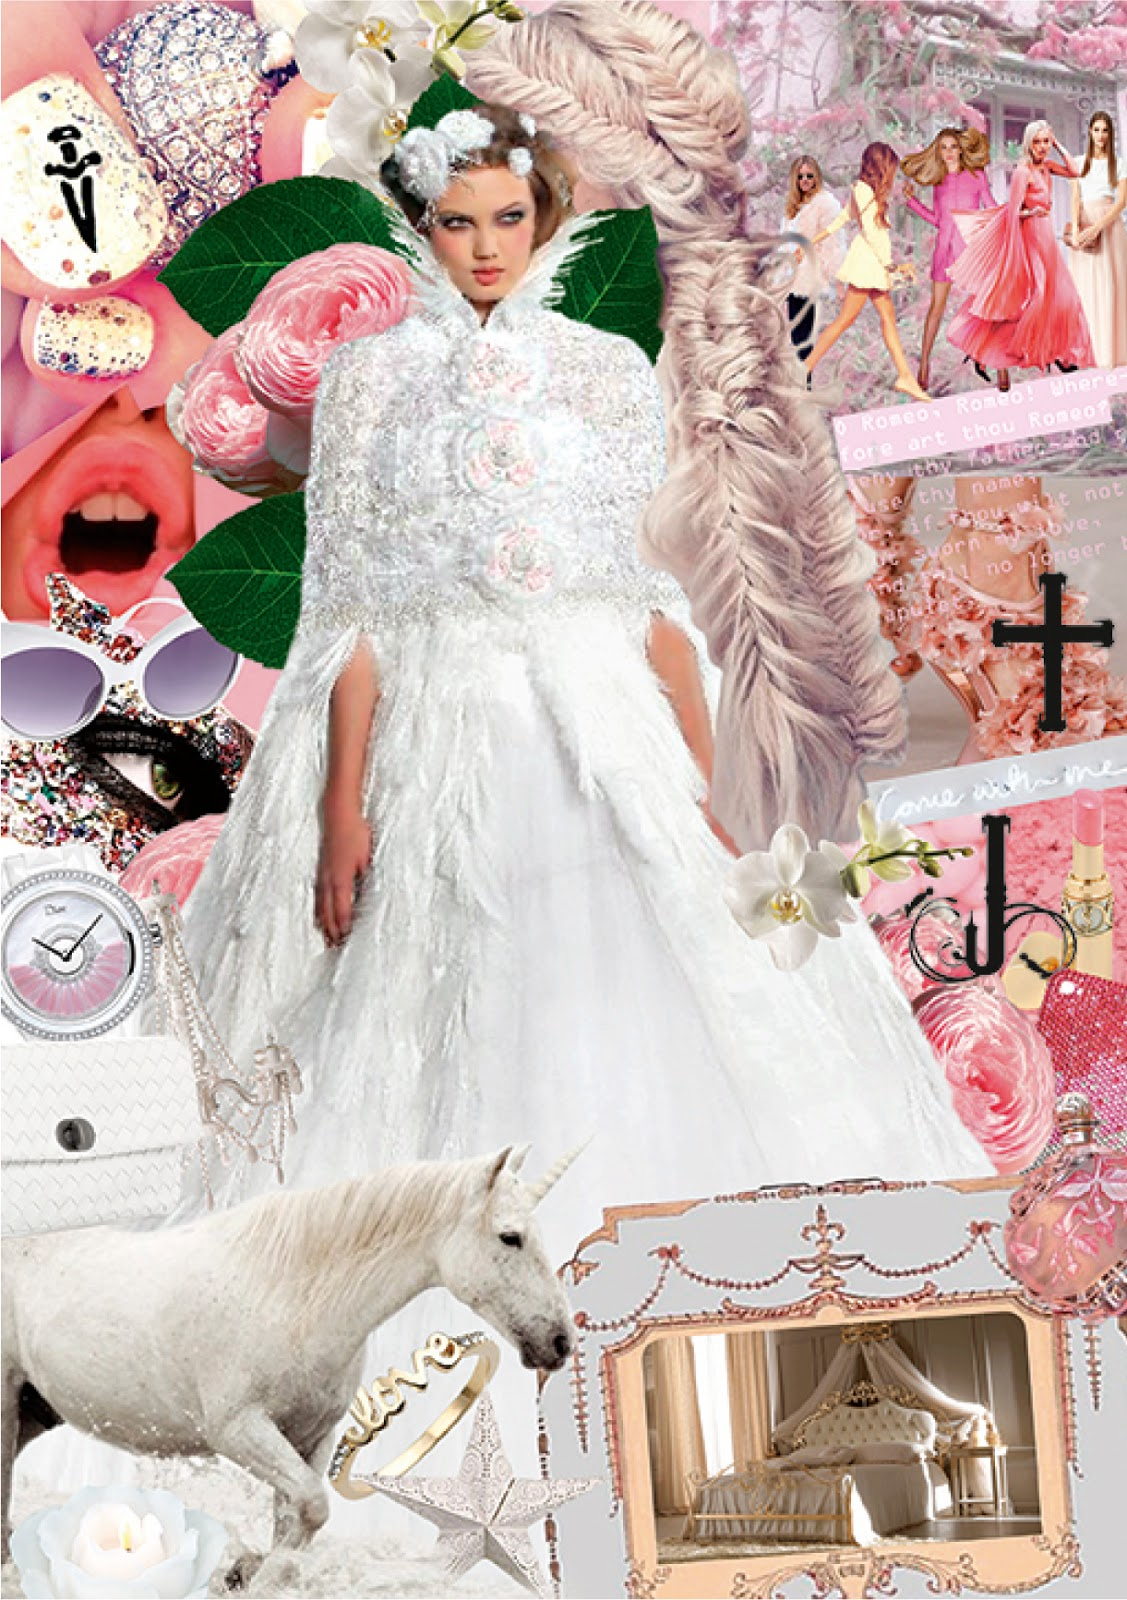 Heidi Mccormack New Look Mood Board Juliet Capulet Romeo Juliet 1968